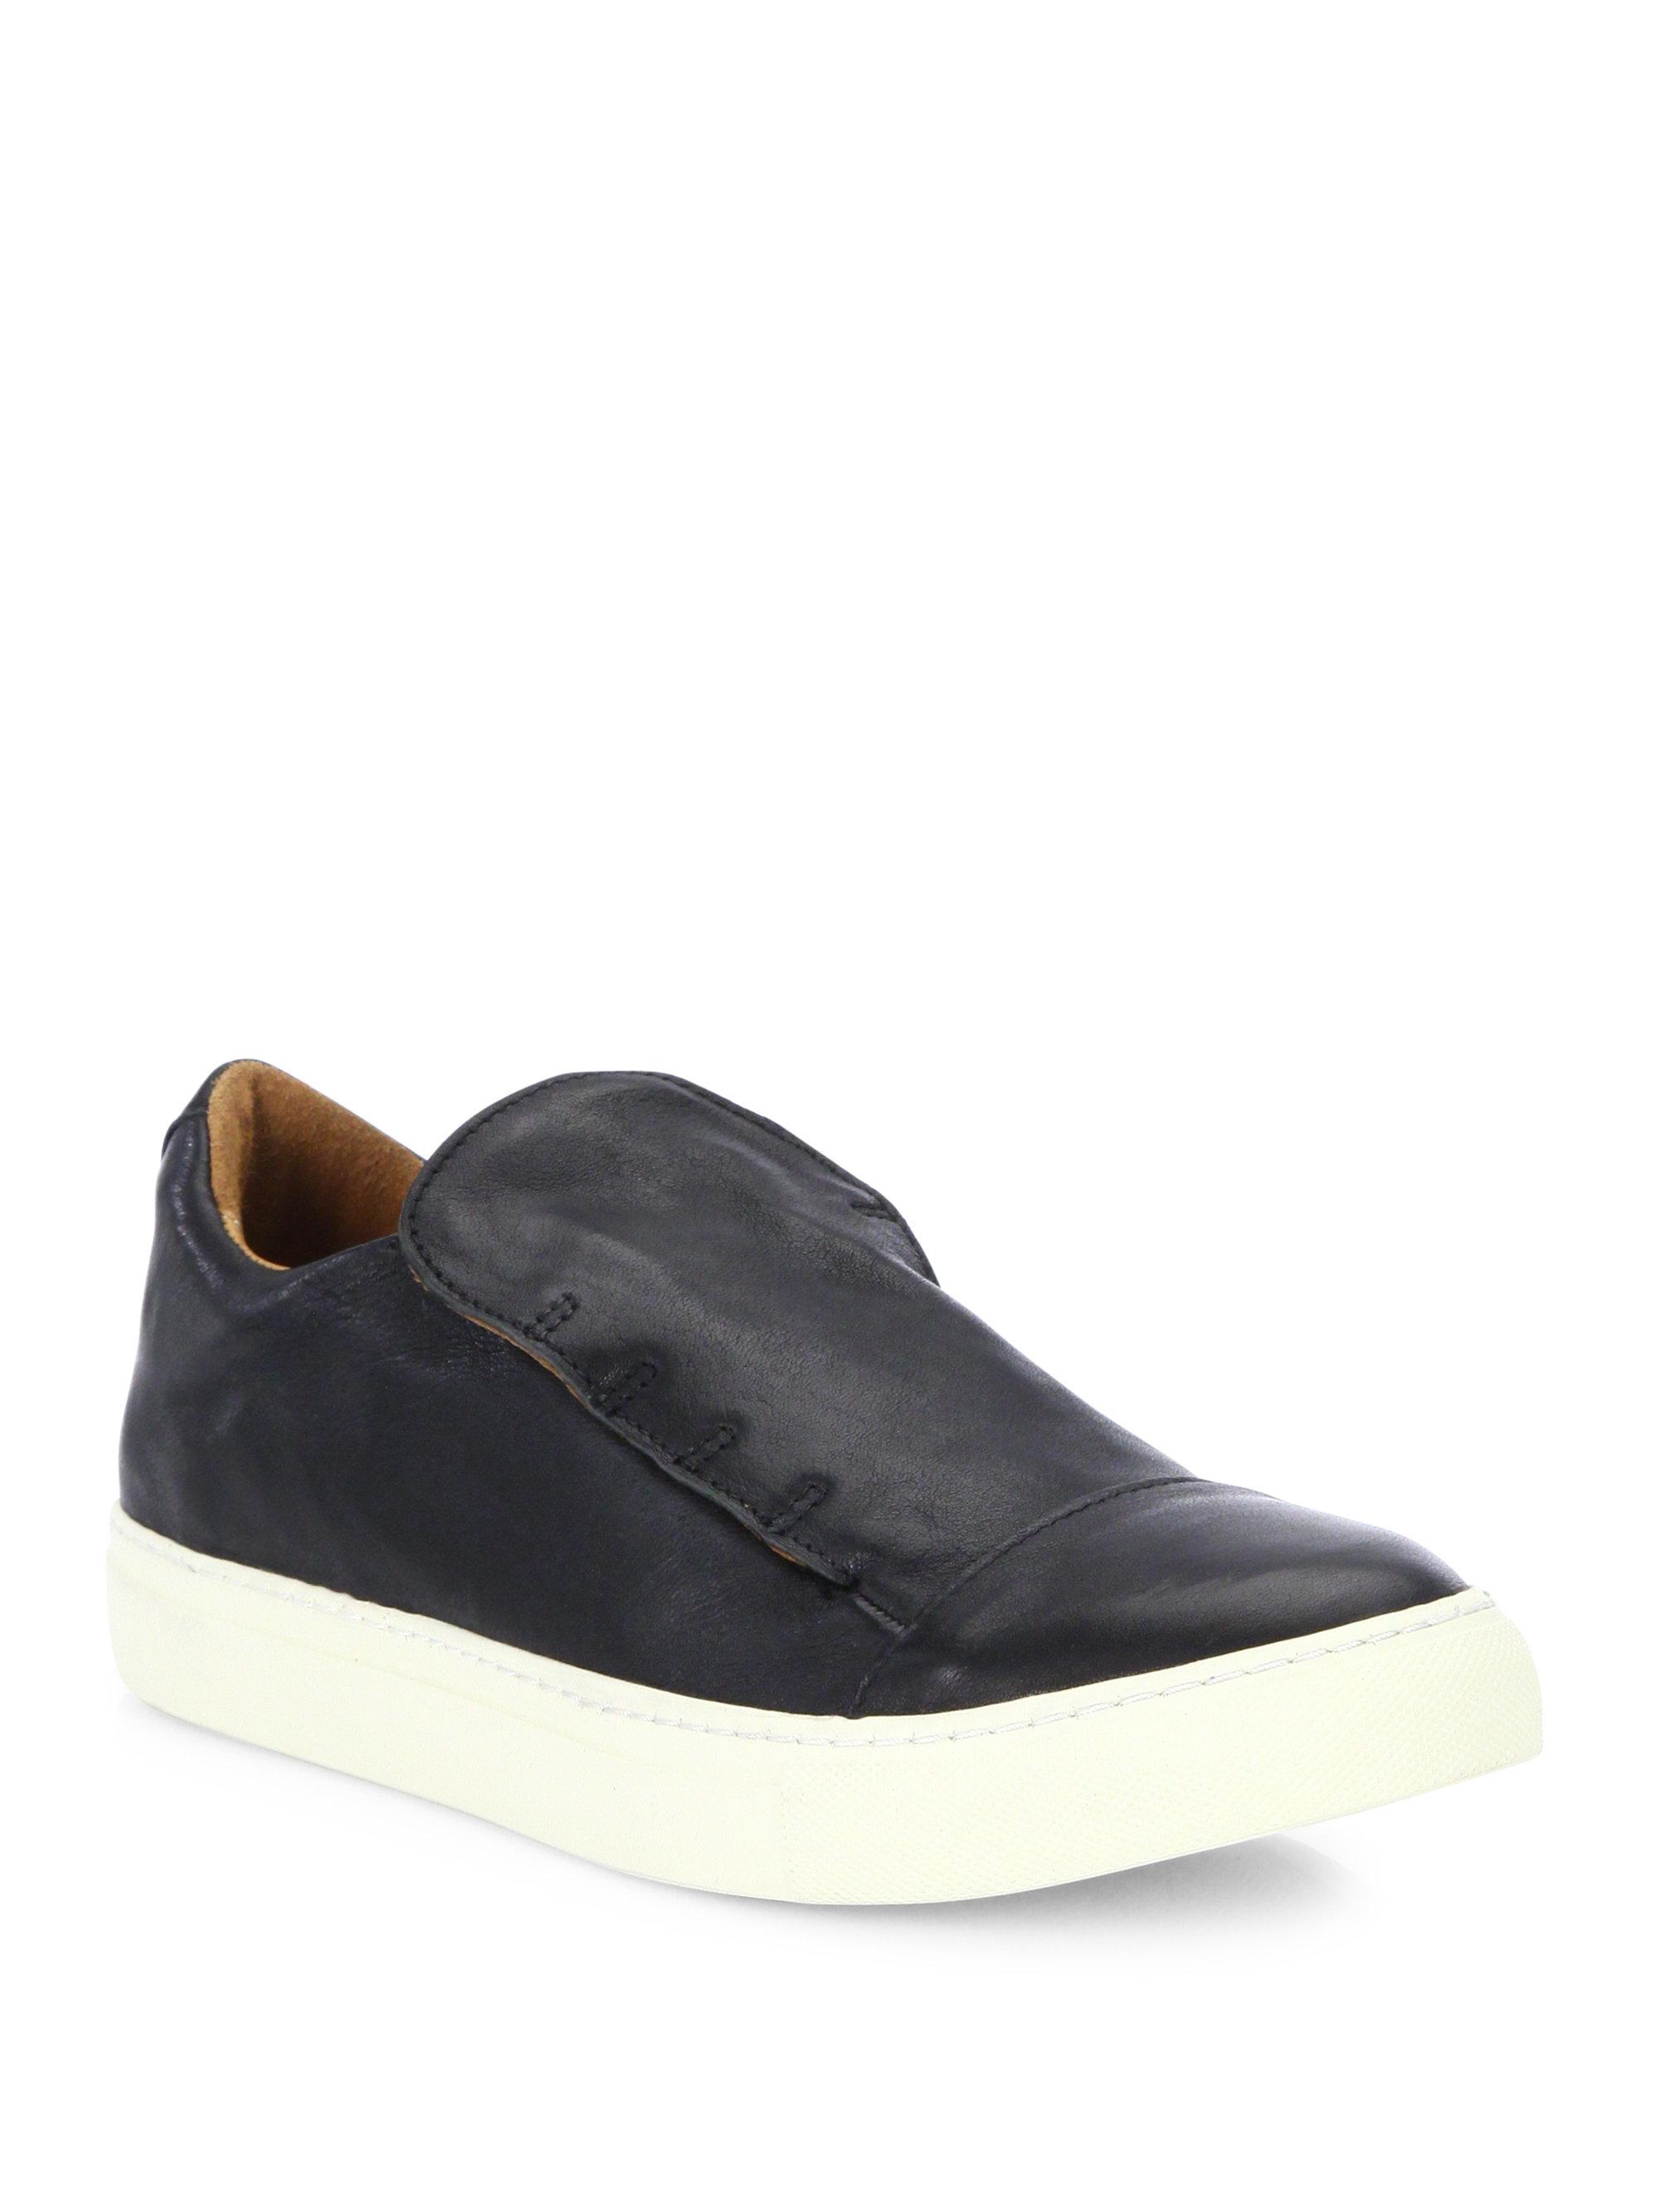 John VarvatosReed Laceless Calfskin Low Sneakers KzzTZPp